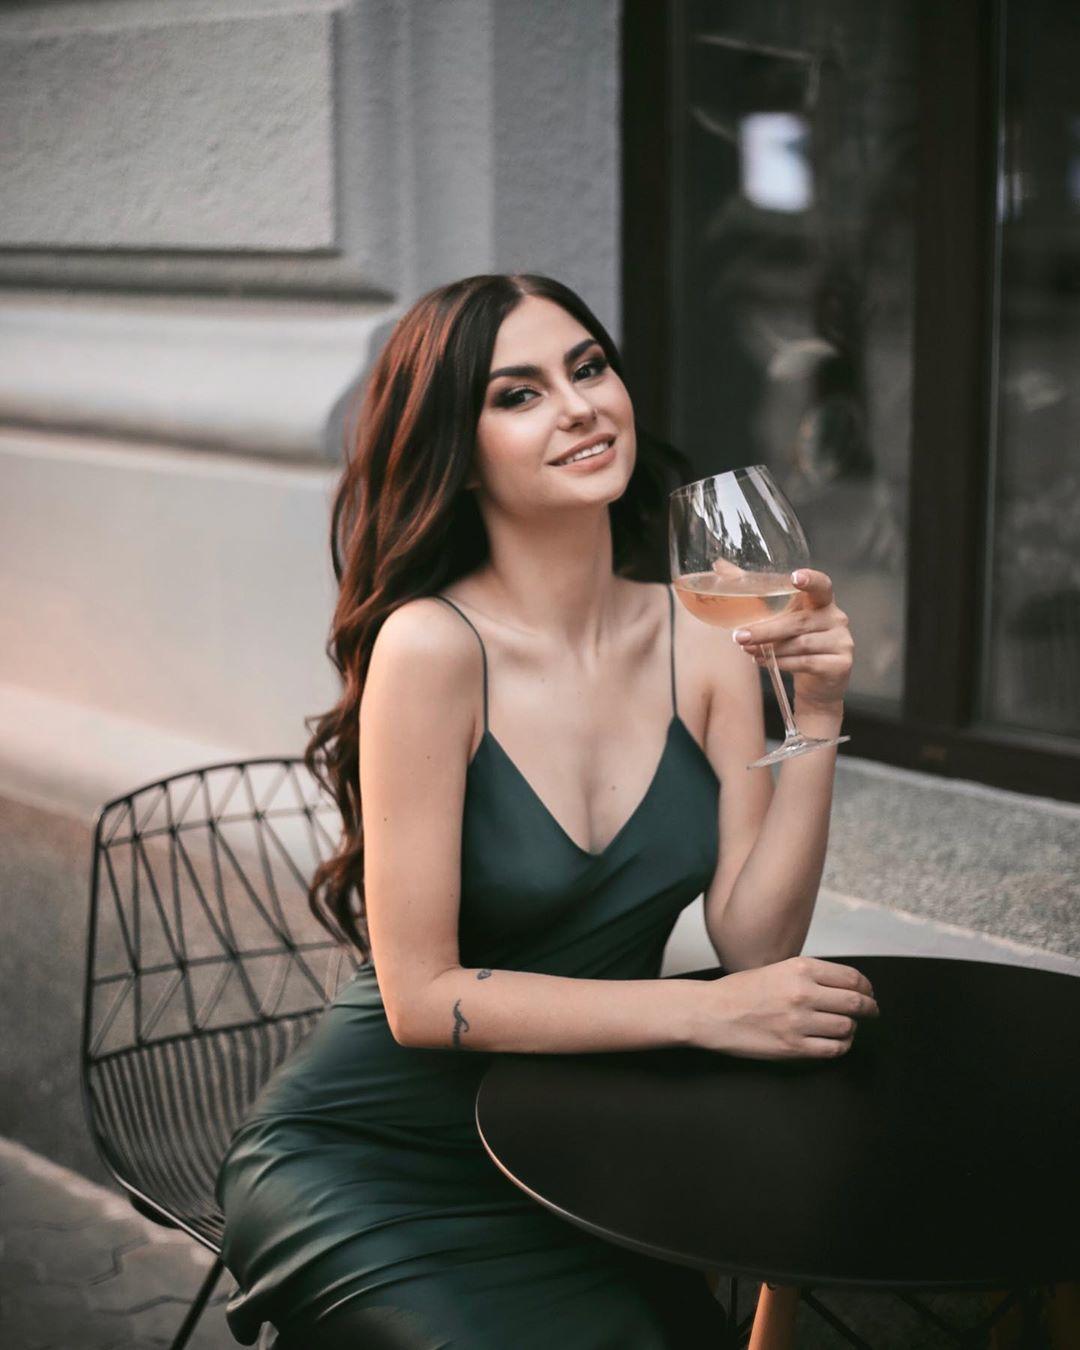 русской марианна дружинец фото из холостяка мен